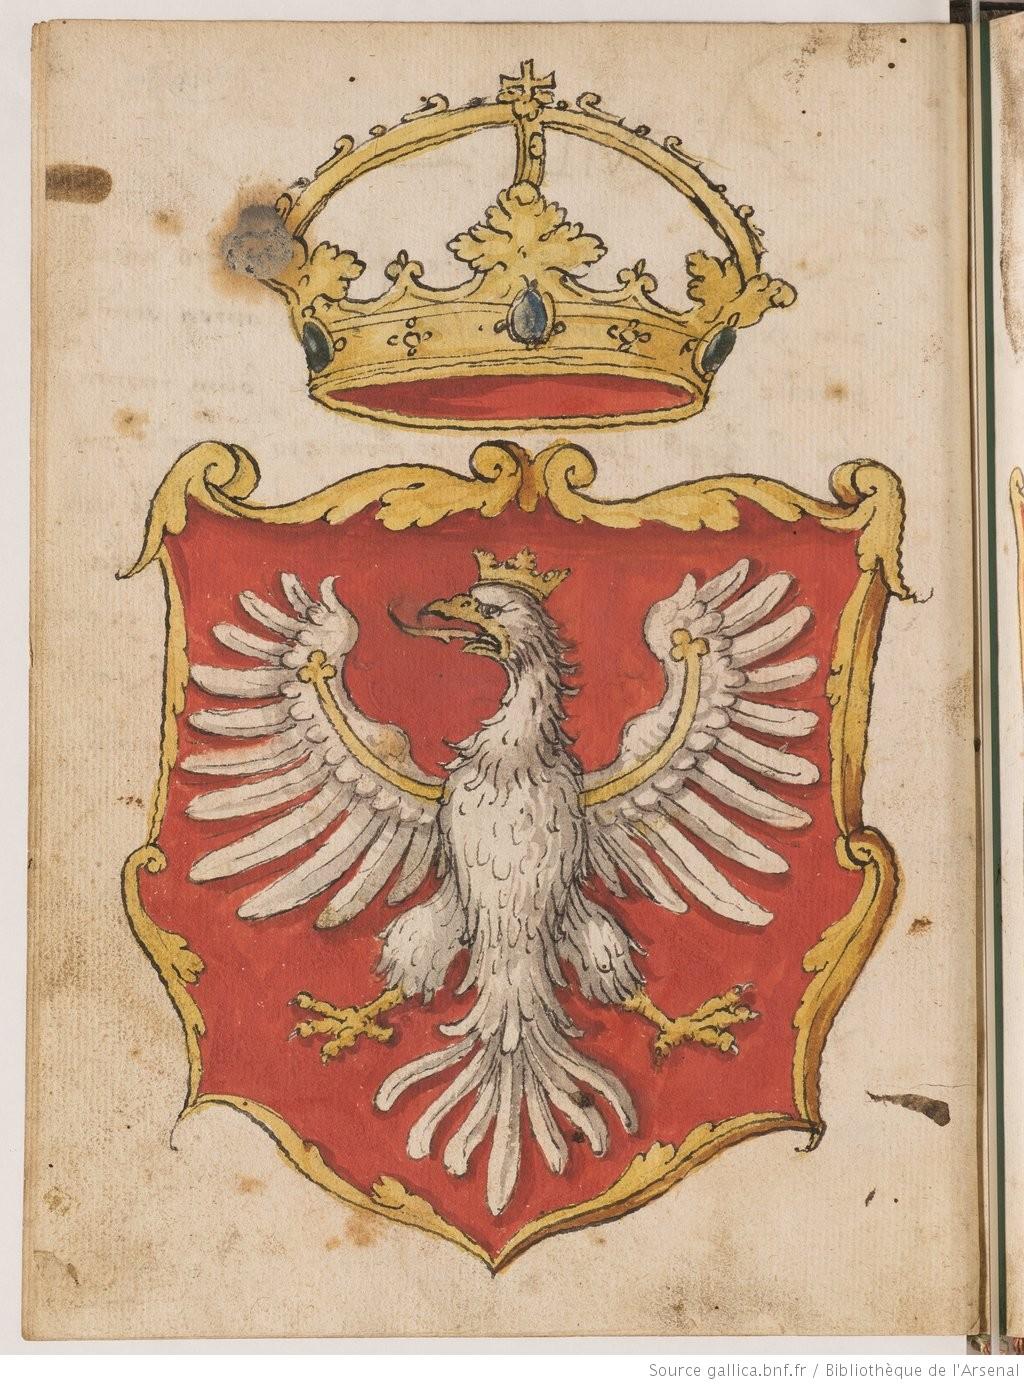 Insignia Seu Clenodia Regis Et Regni Poloniae ältestes Polnisches